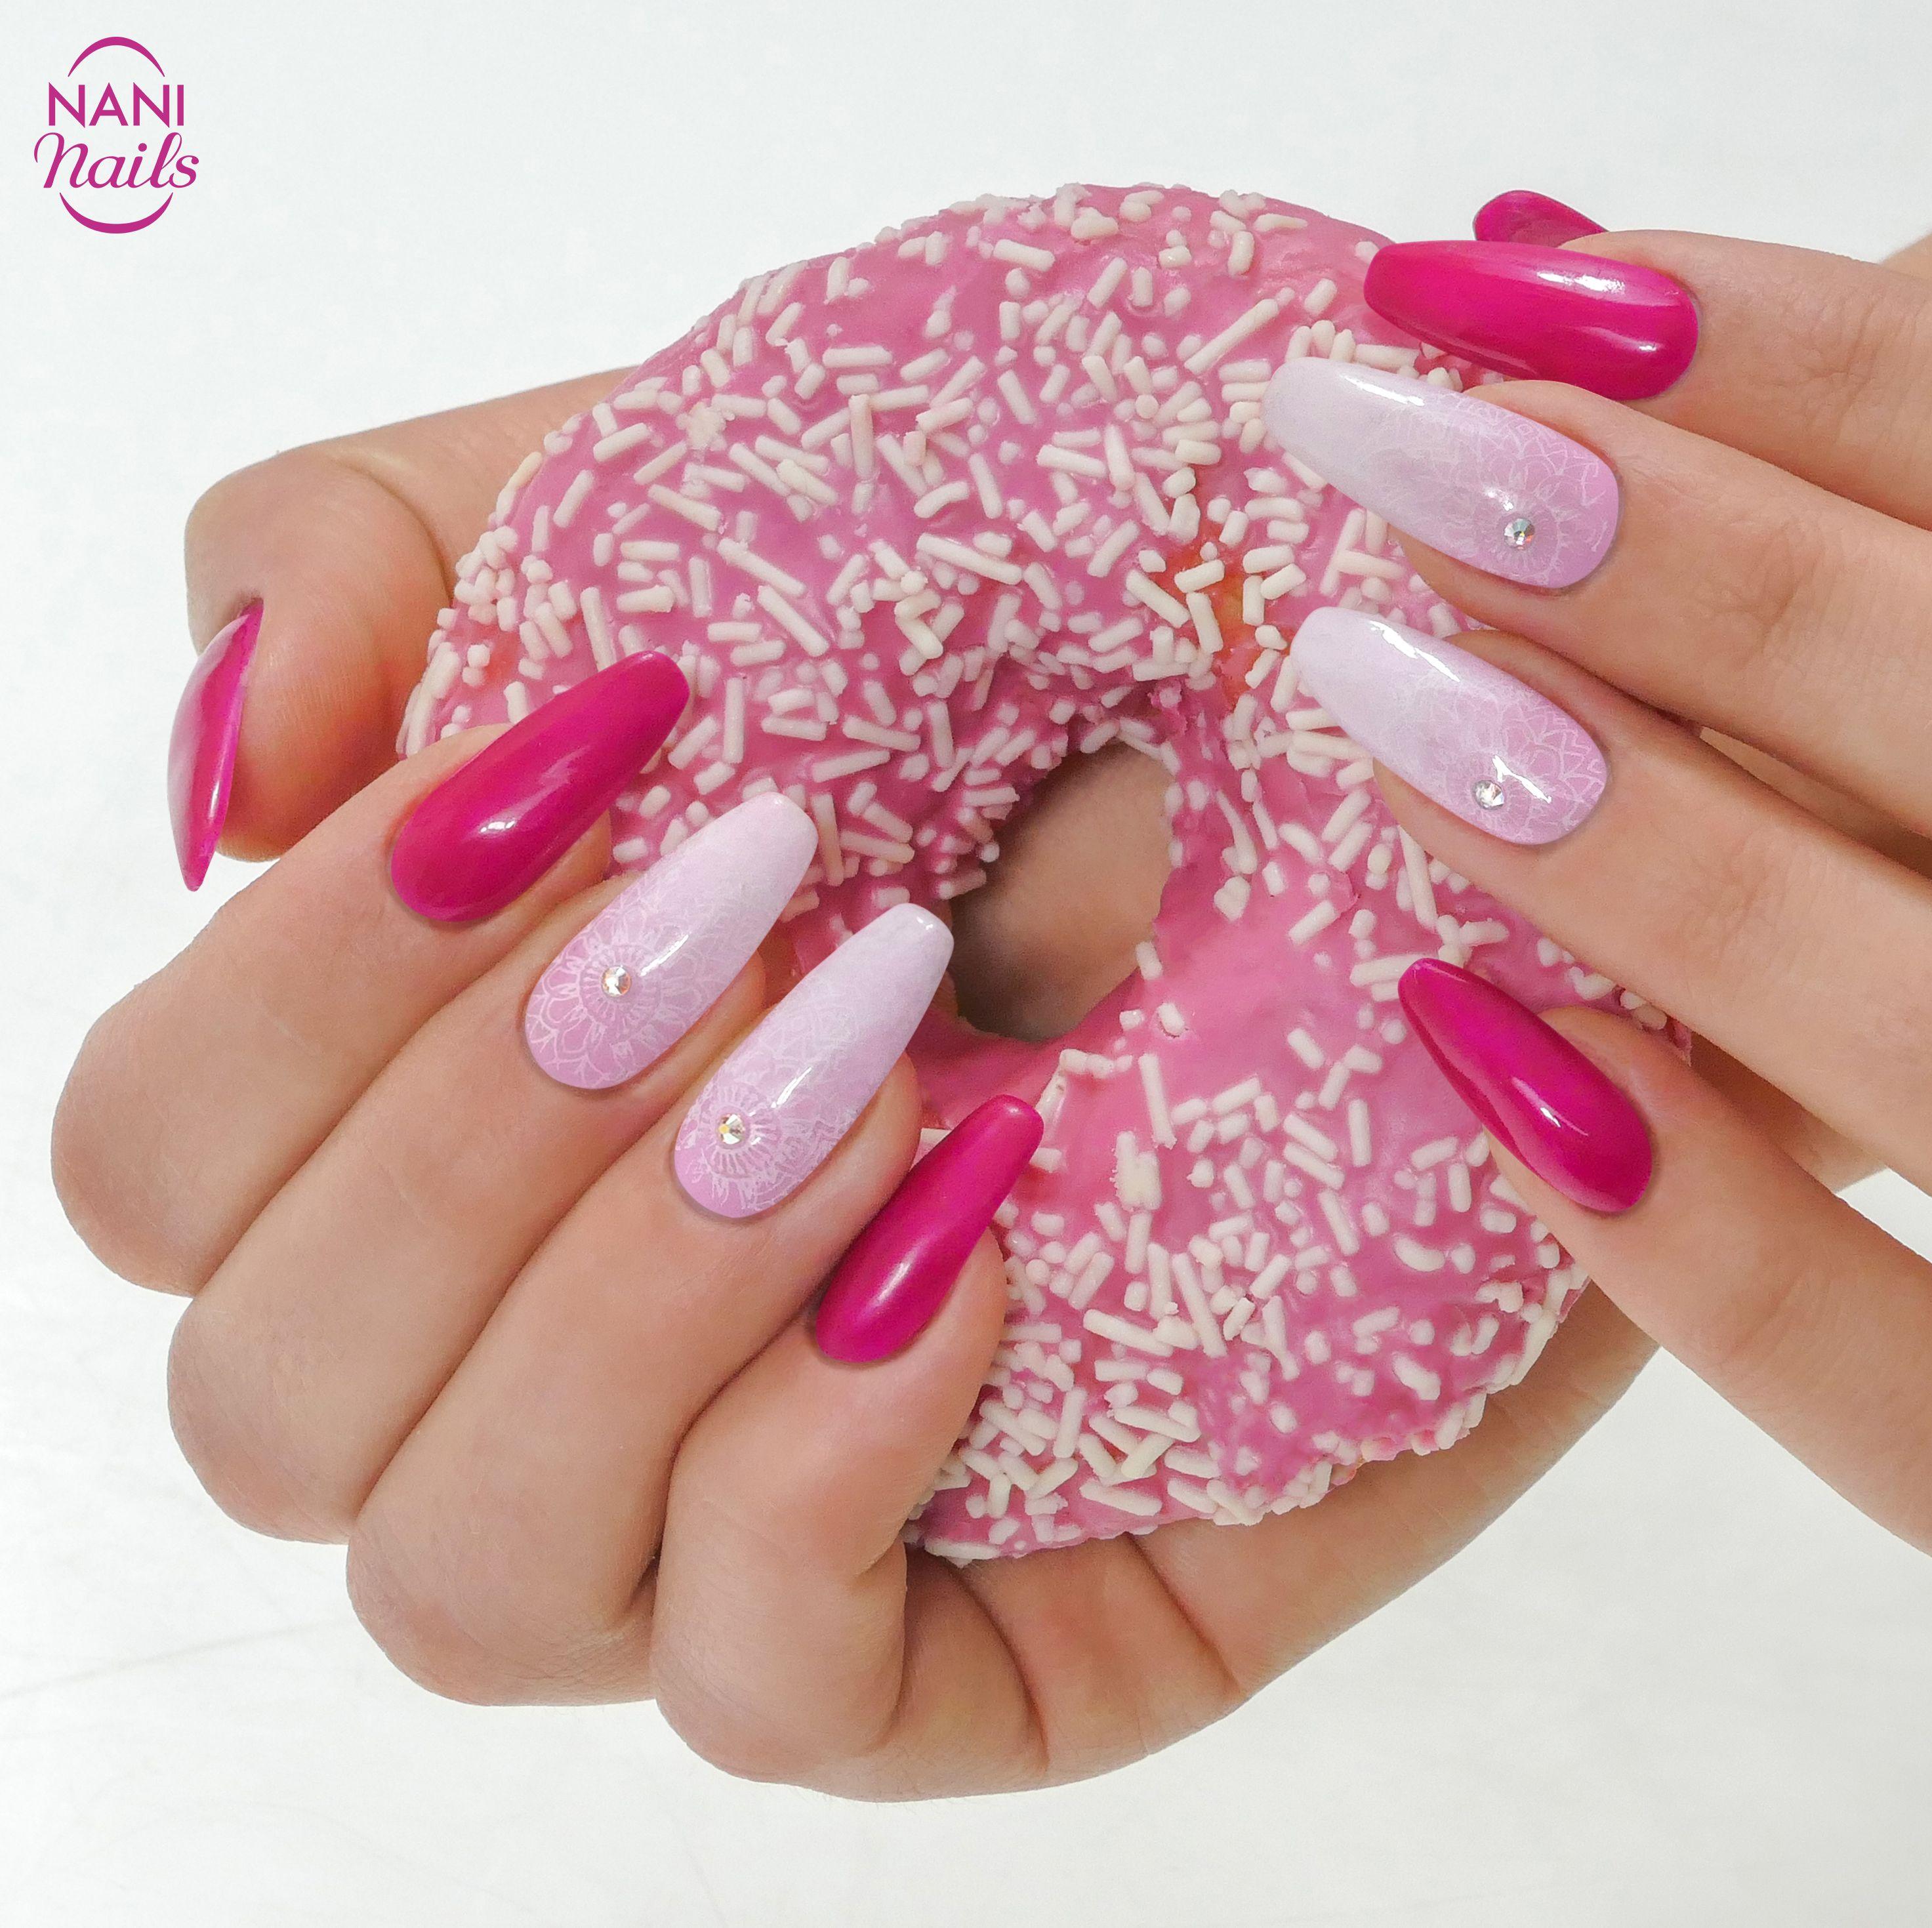 Lahodna Kombinace Vyrazne Ruzove A Jemneho Ombre Co K Tomu Rict Manikura K Nakousnuti Stejne Jako Lakavy Donut Pink Manicure Gelove Nehty Nail Art Nehty